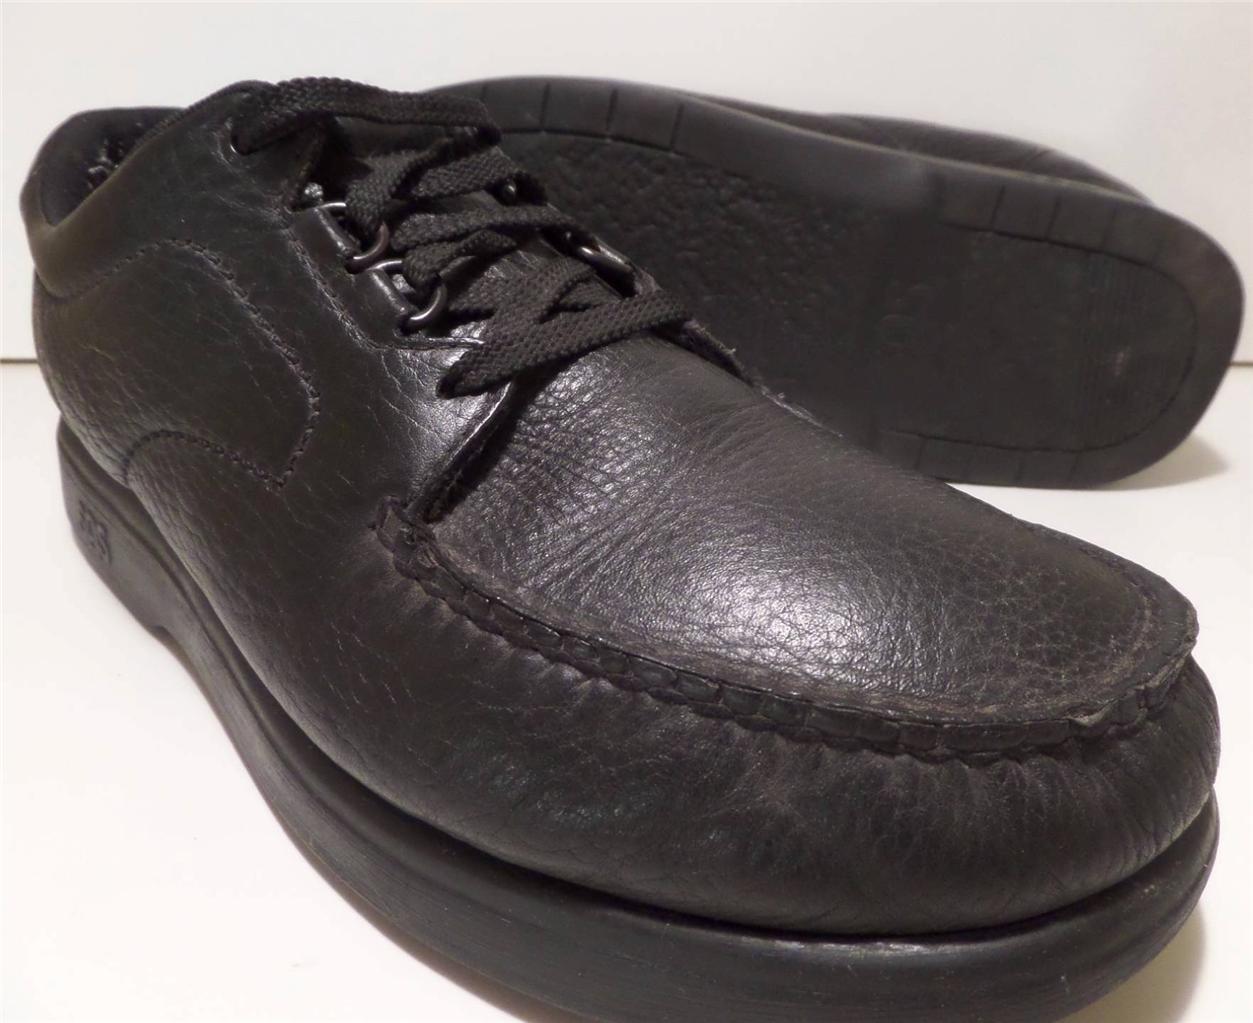 Details about SAS Comfort Shoes free BOUT TIME Black 11 M